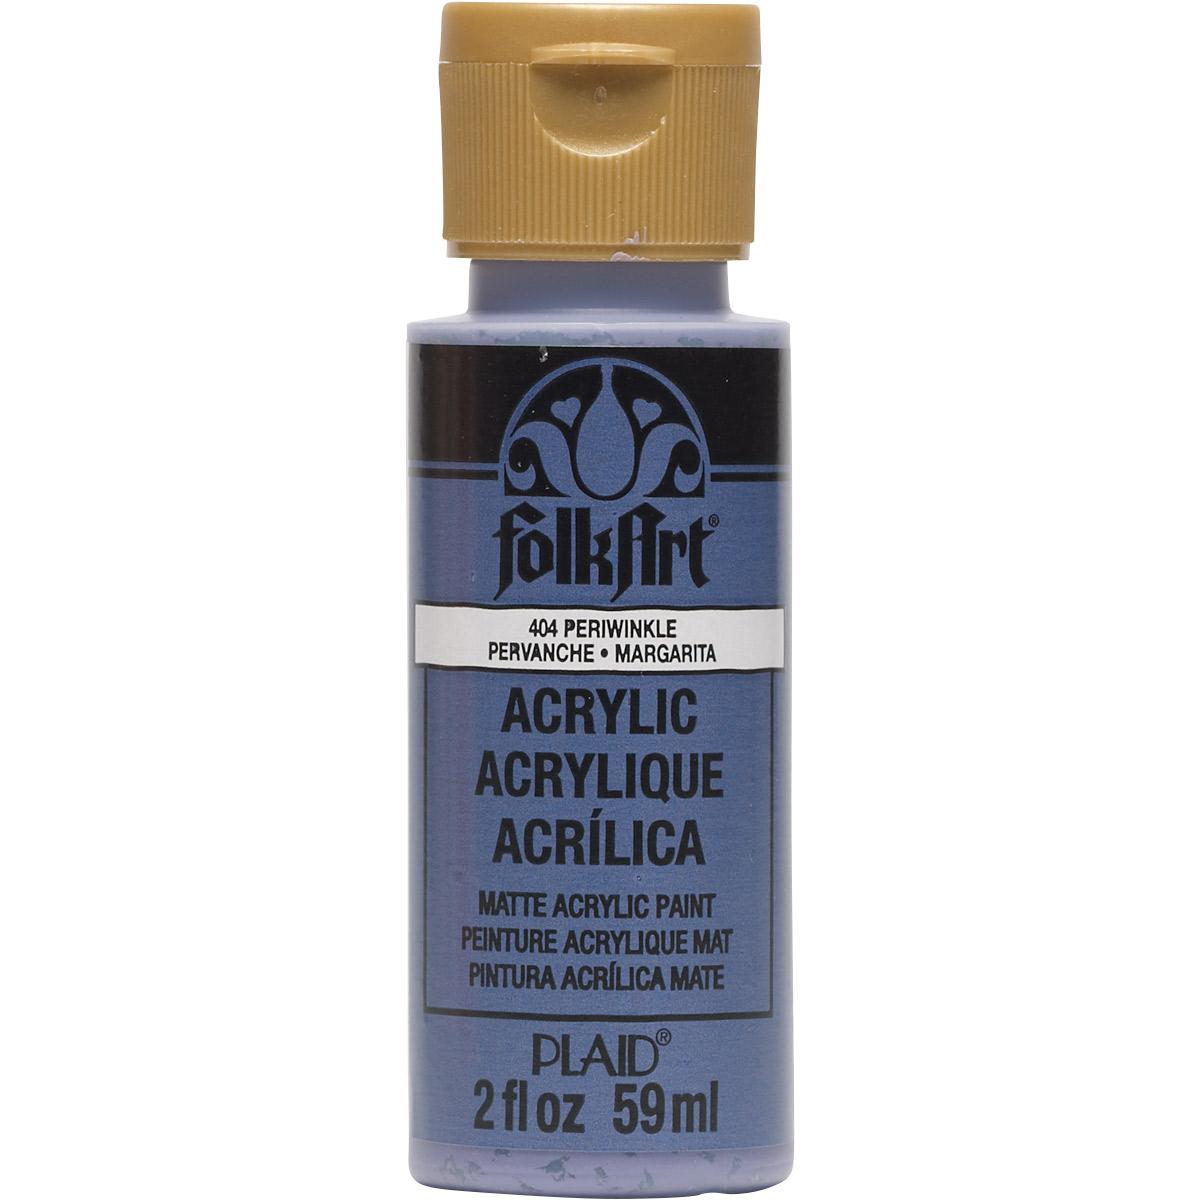 FolkArt ® Acrylic Colors - Periwinkle, 2 oz.